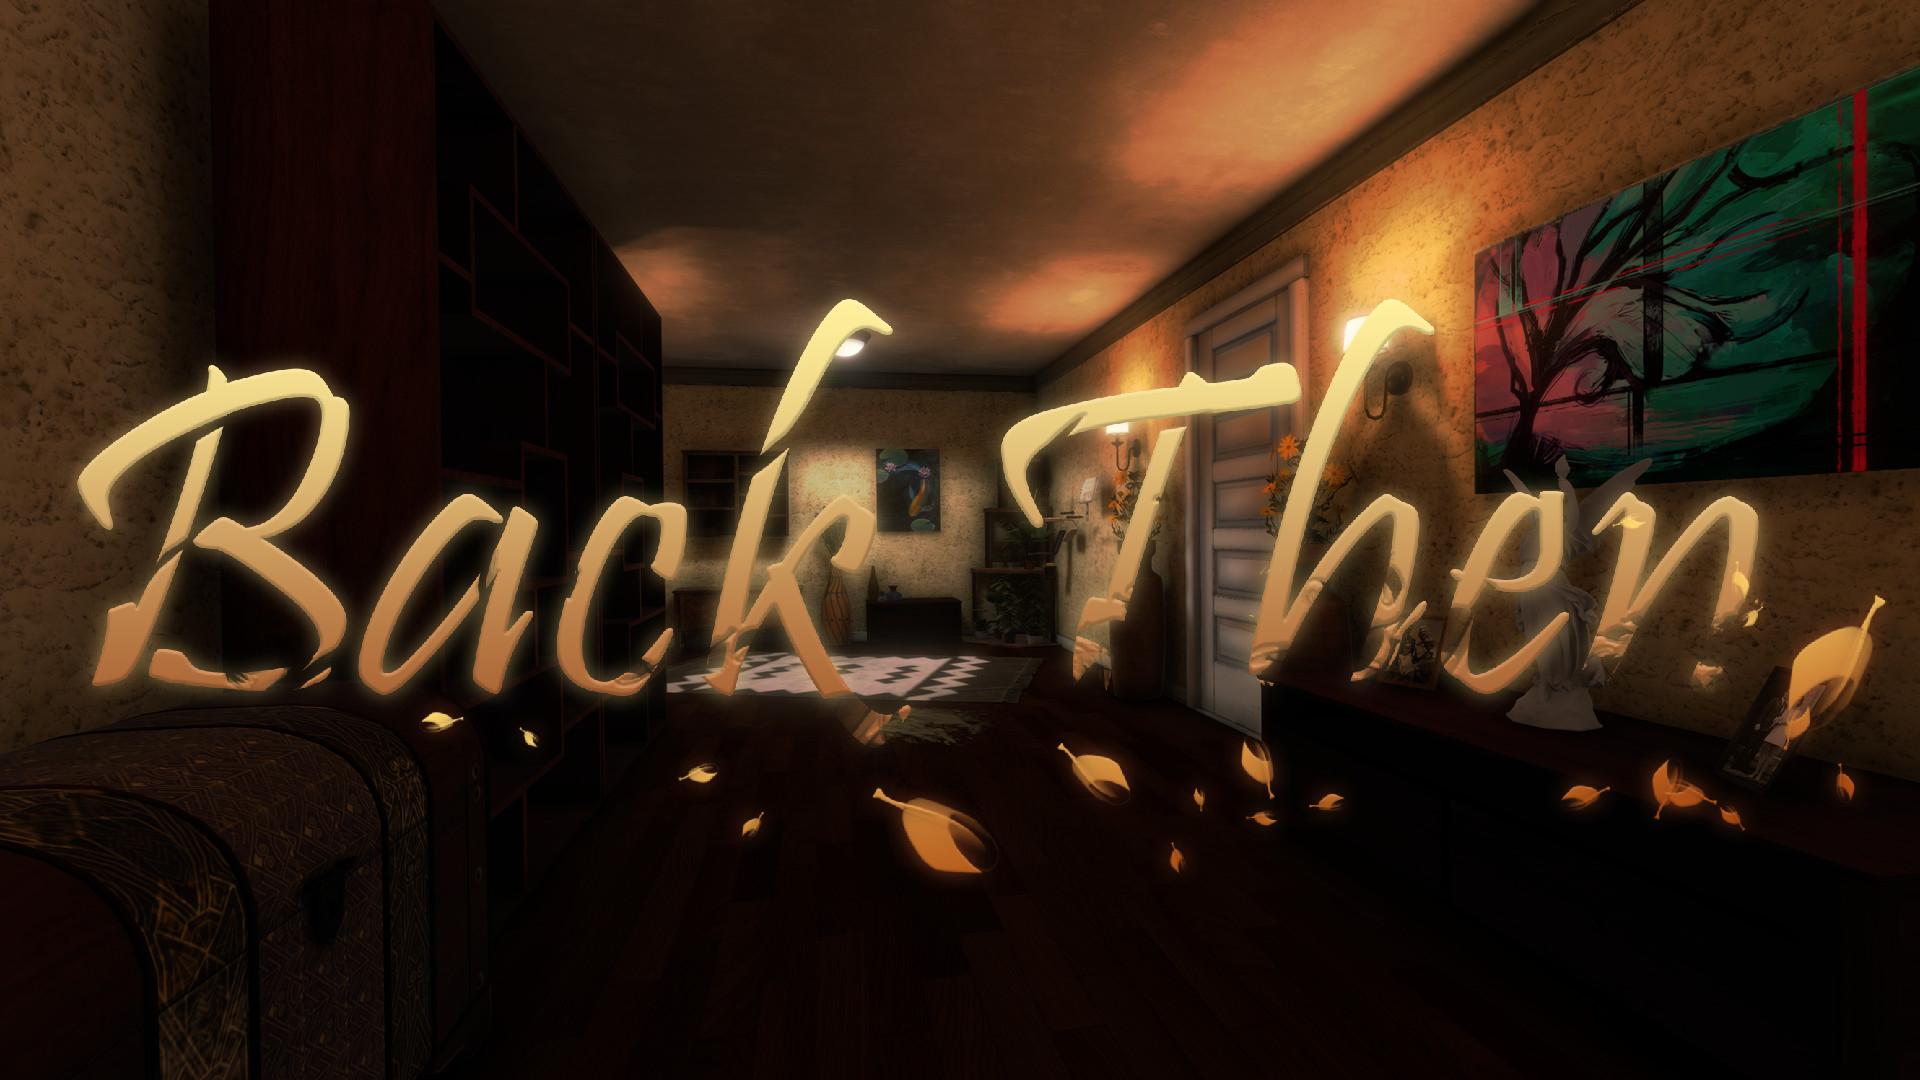 Back Then – Story Teaser Trailer